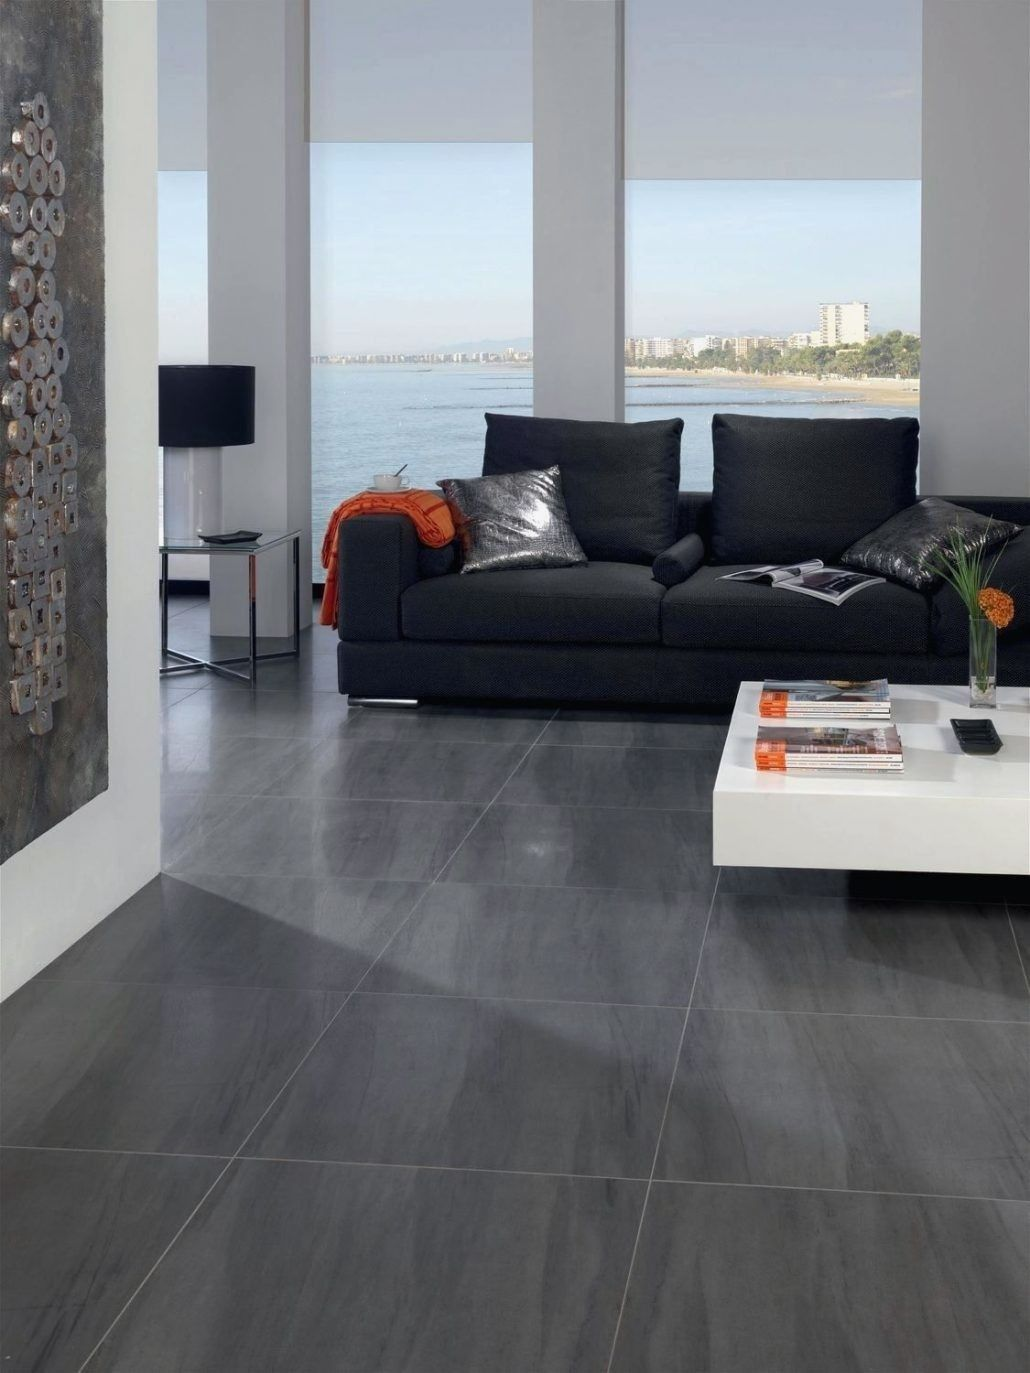 16 Floor Tile Design In Nigeria I 2020 Design Granit #wall #tiles #design #living #room